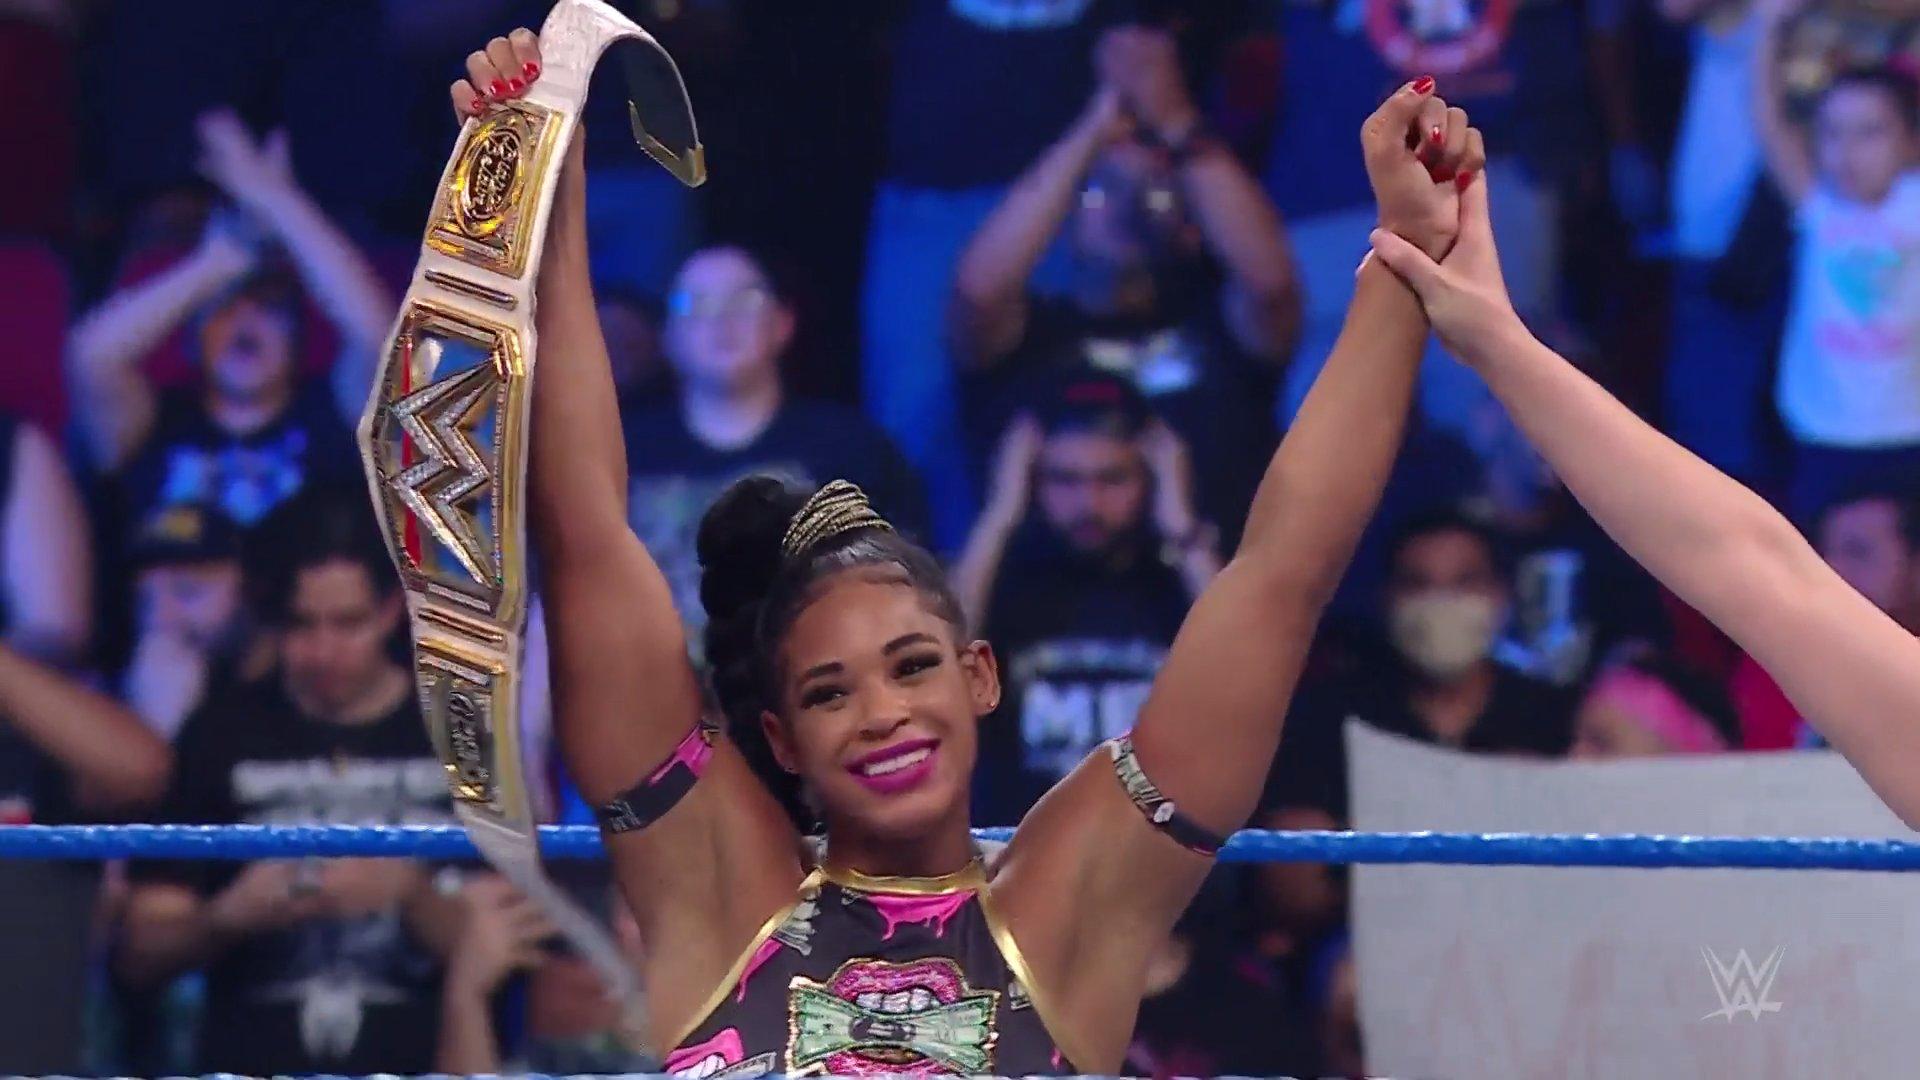 Bianca Belair mantêm a posse do SmackDown Women's Championship